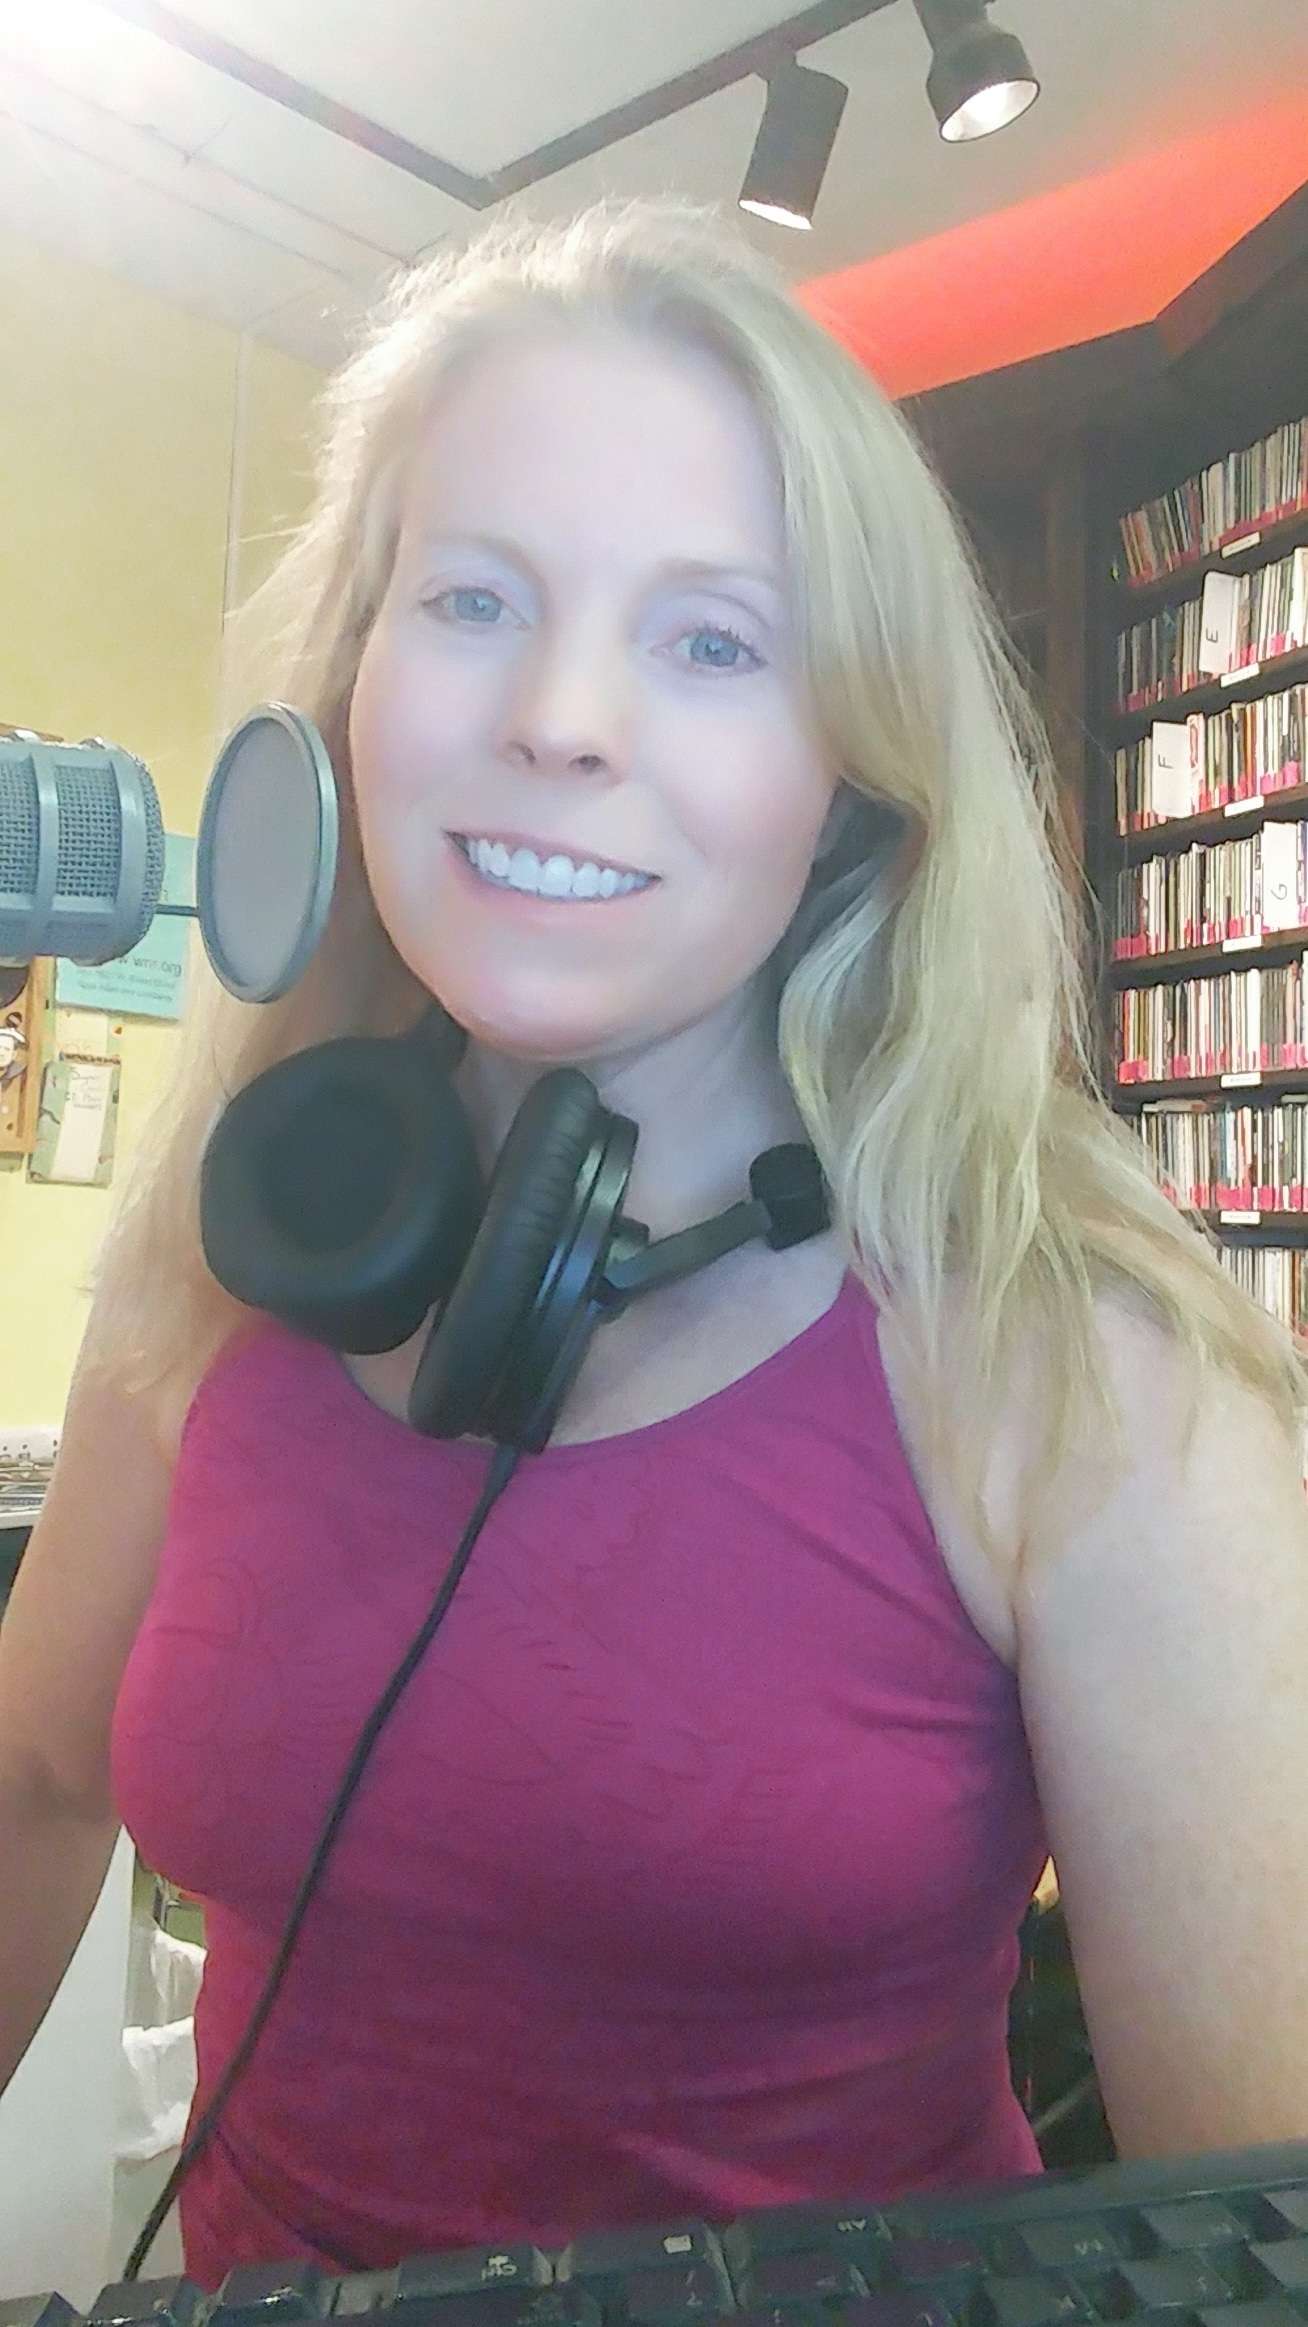 Hosting Francosonic radio on WRIR 97.3 FM